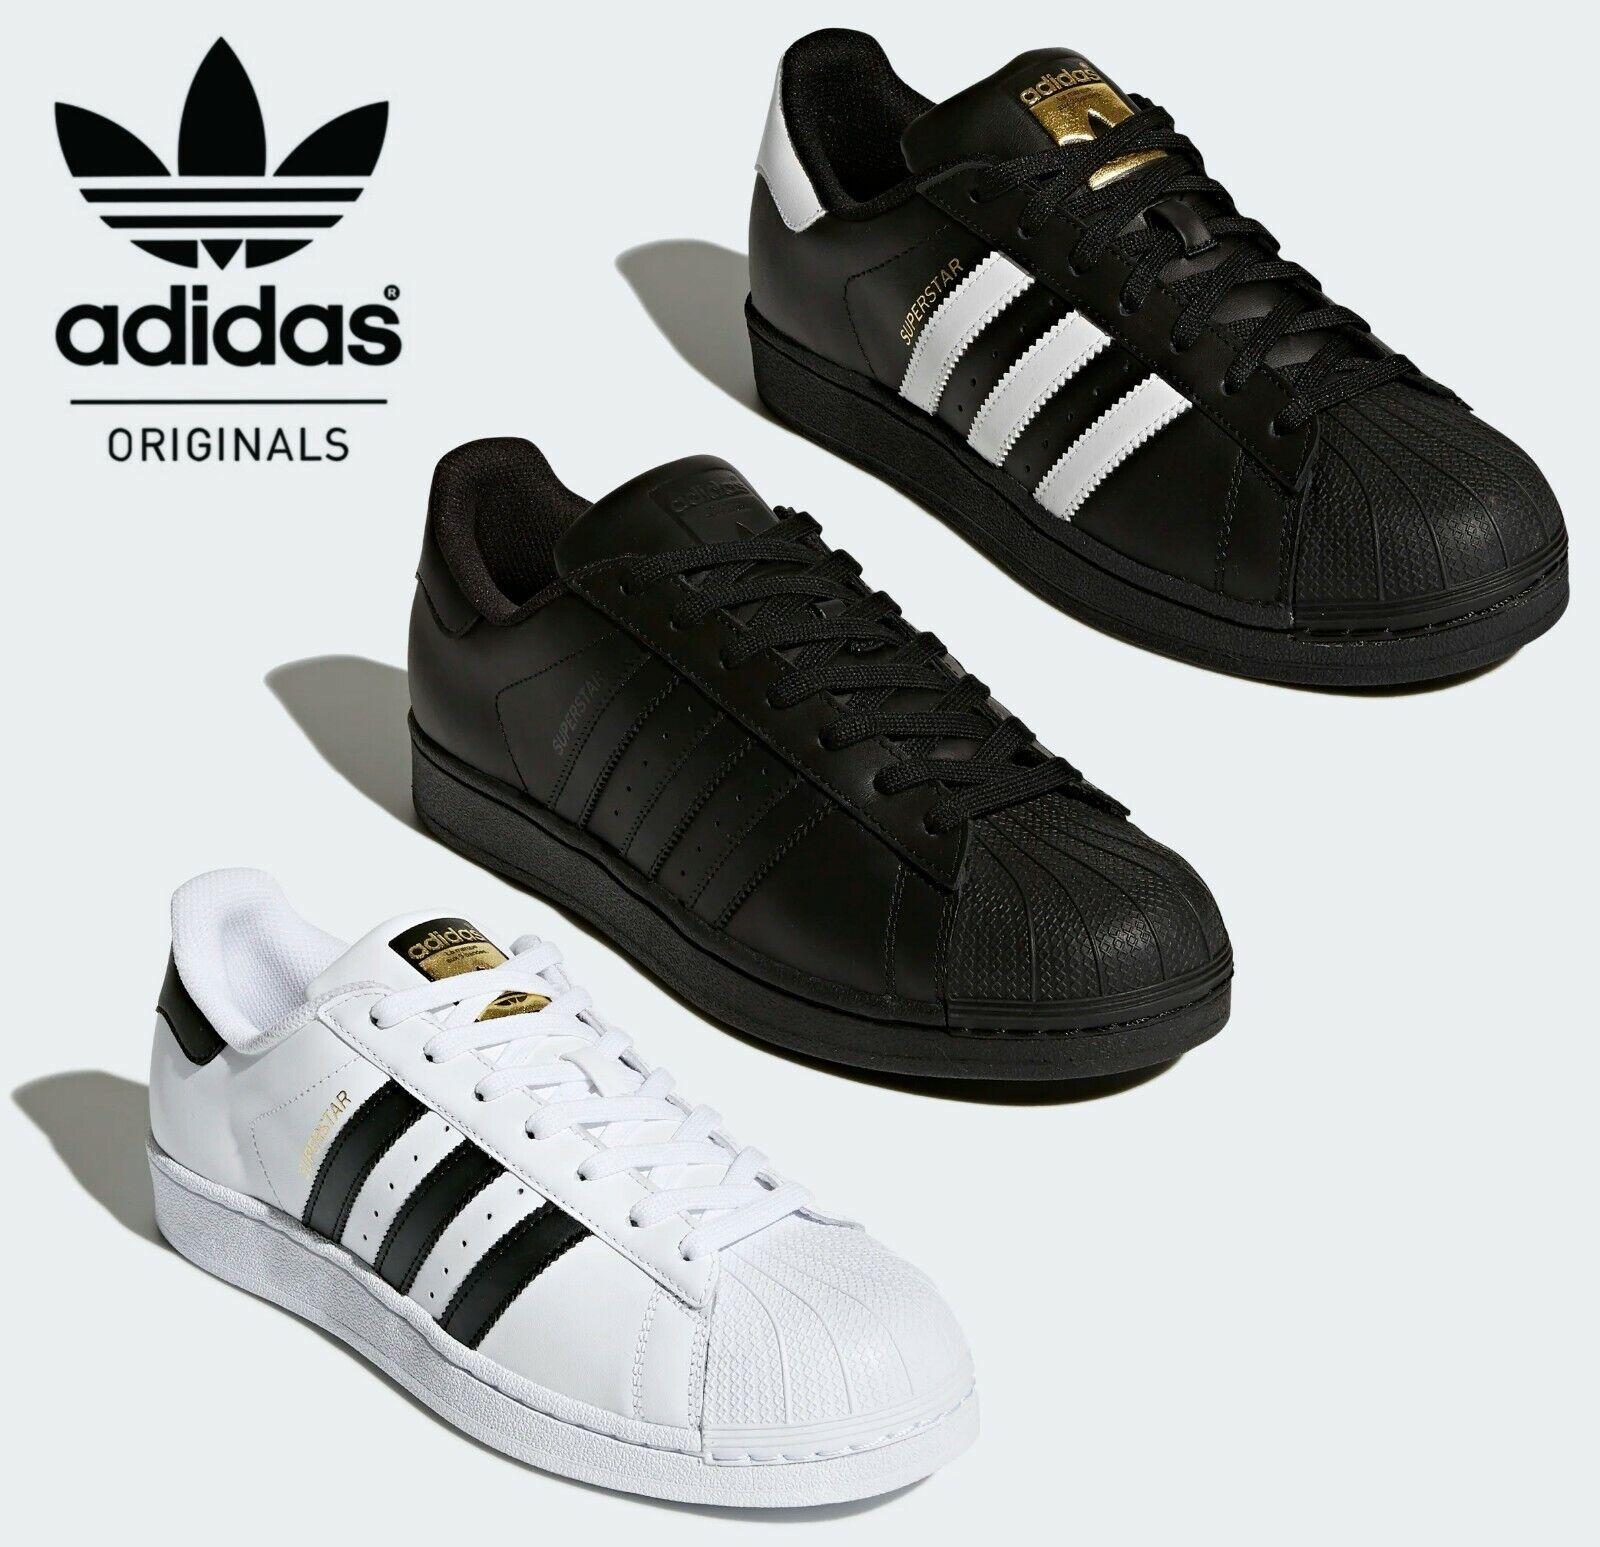 Adidas Superstar Foundation Originals